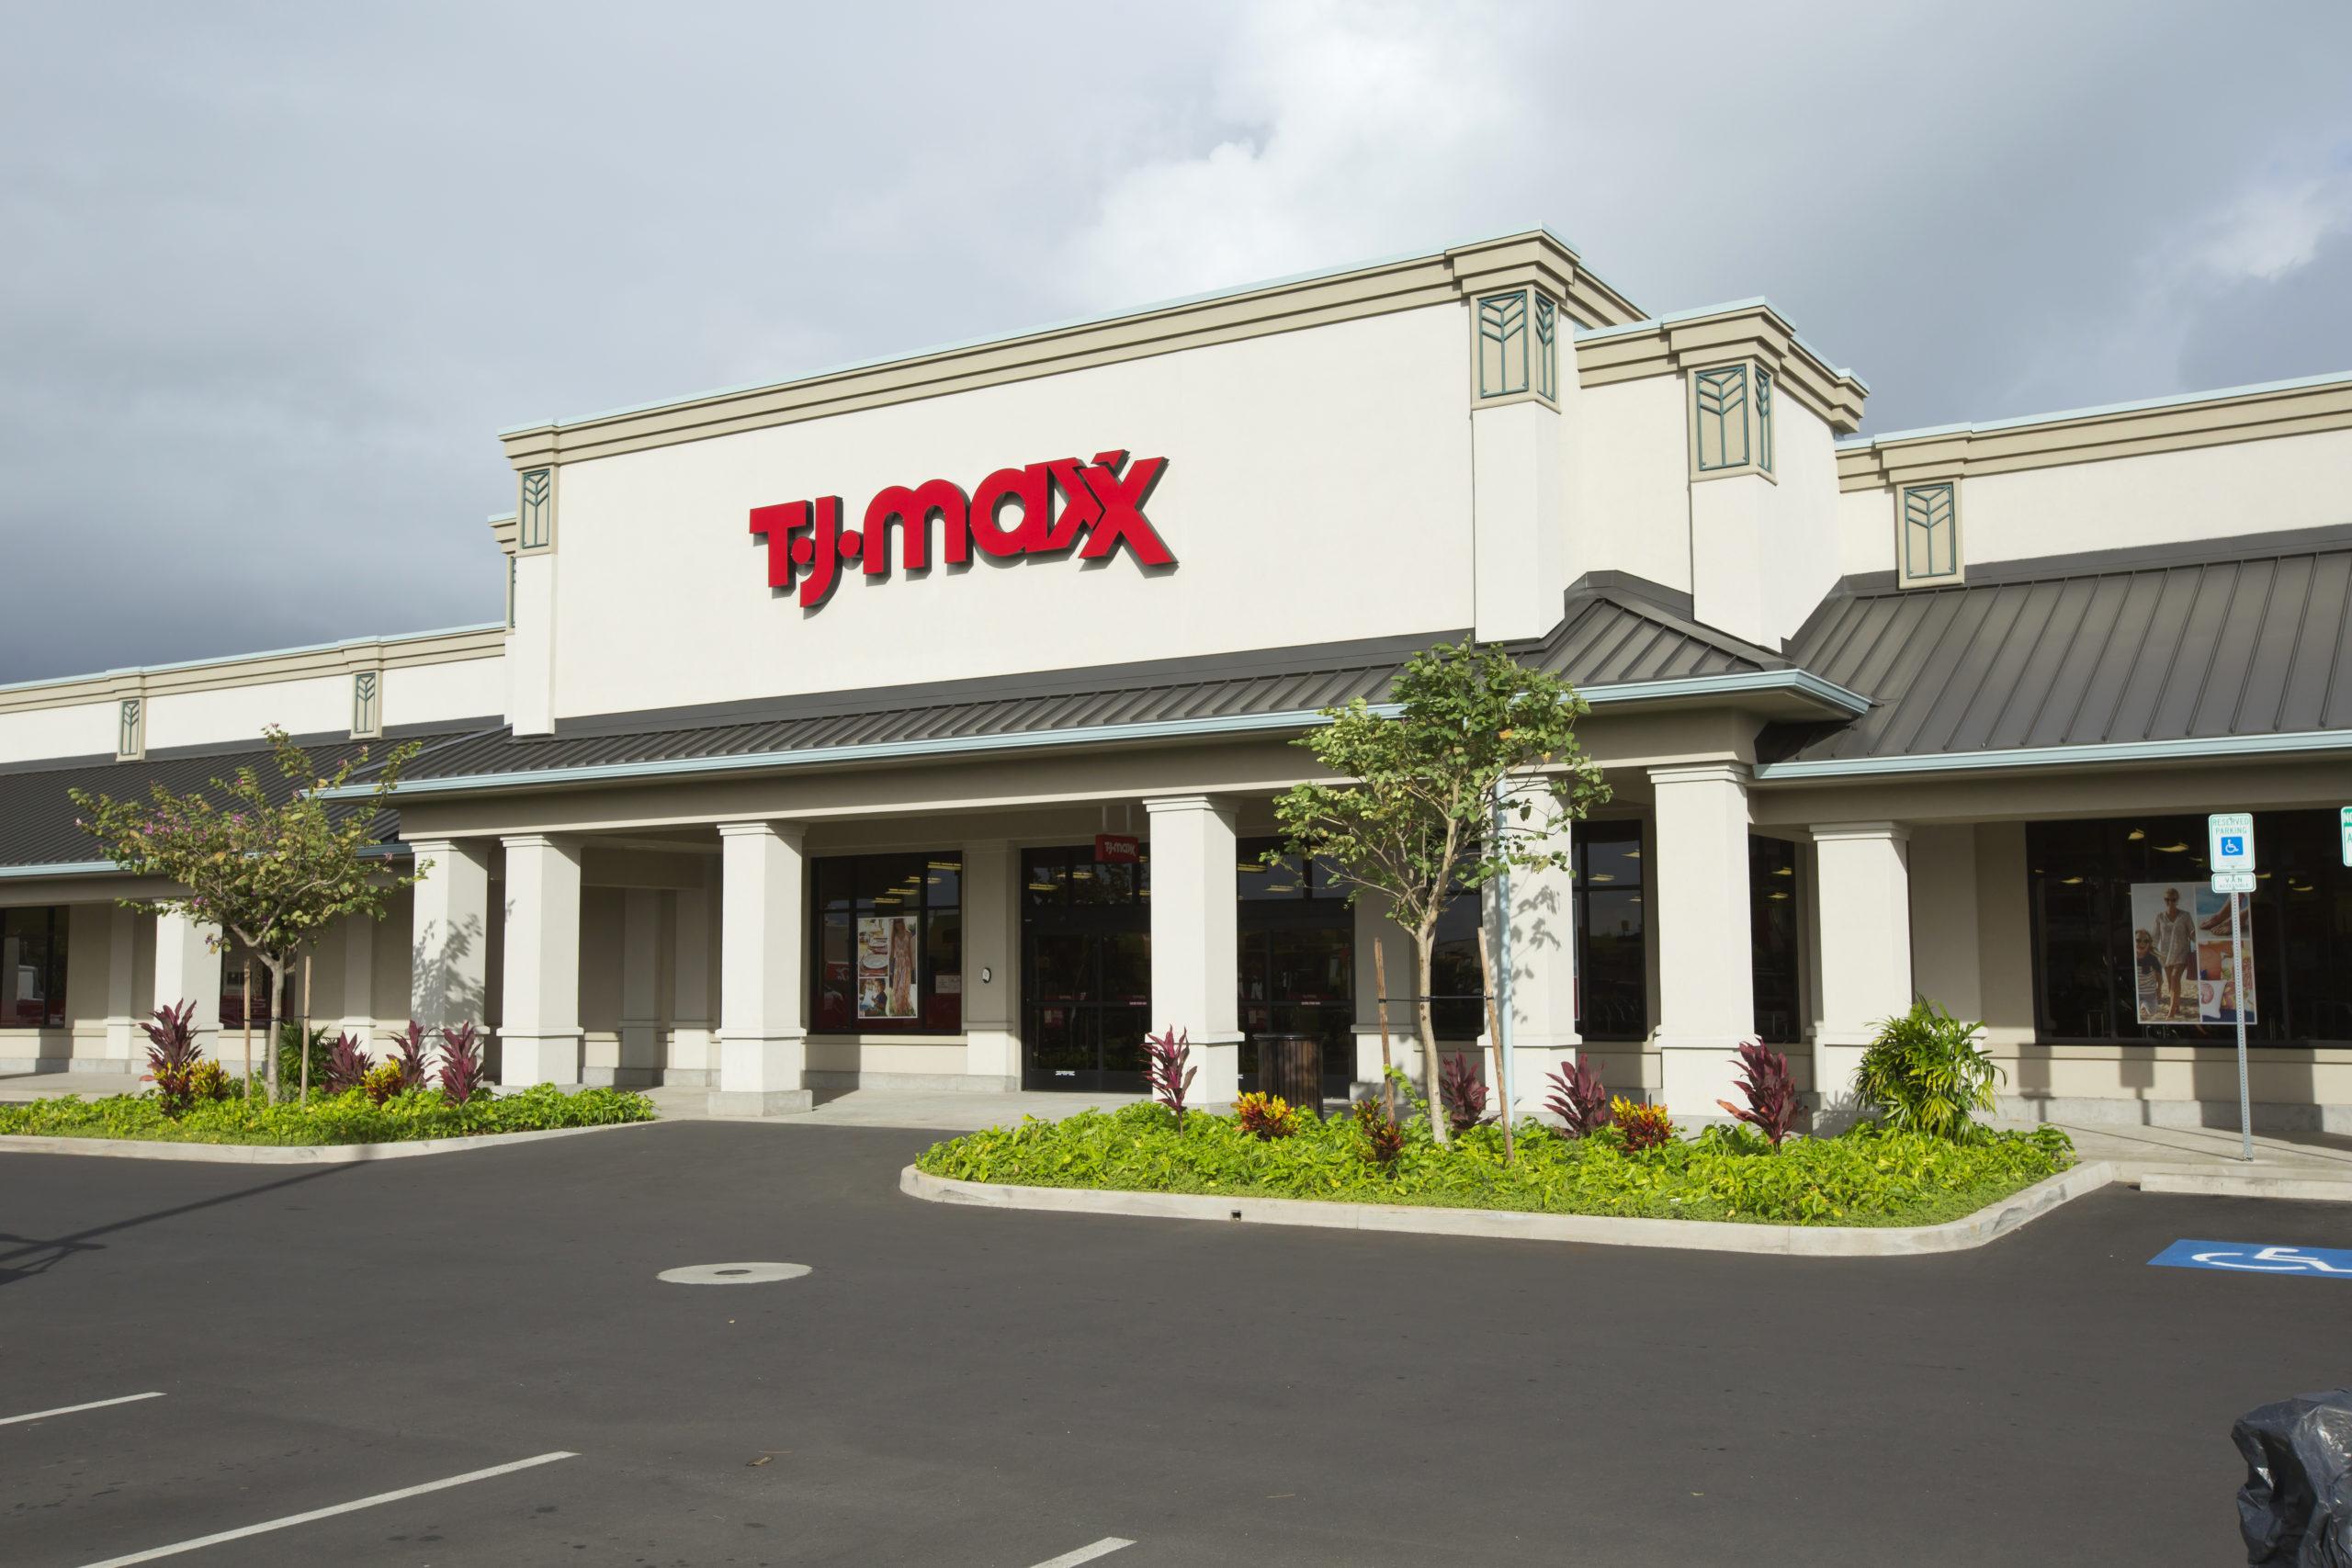 TJ Maxx Maui